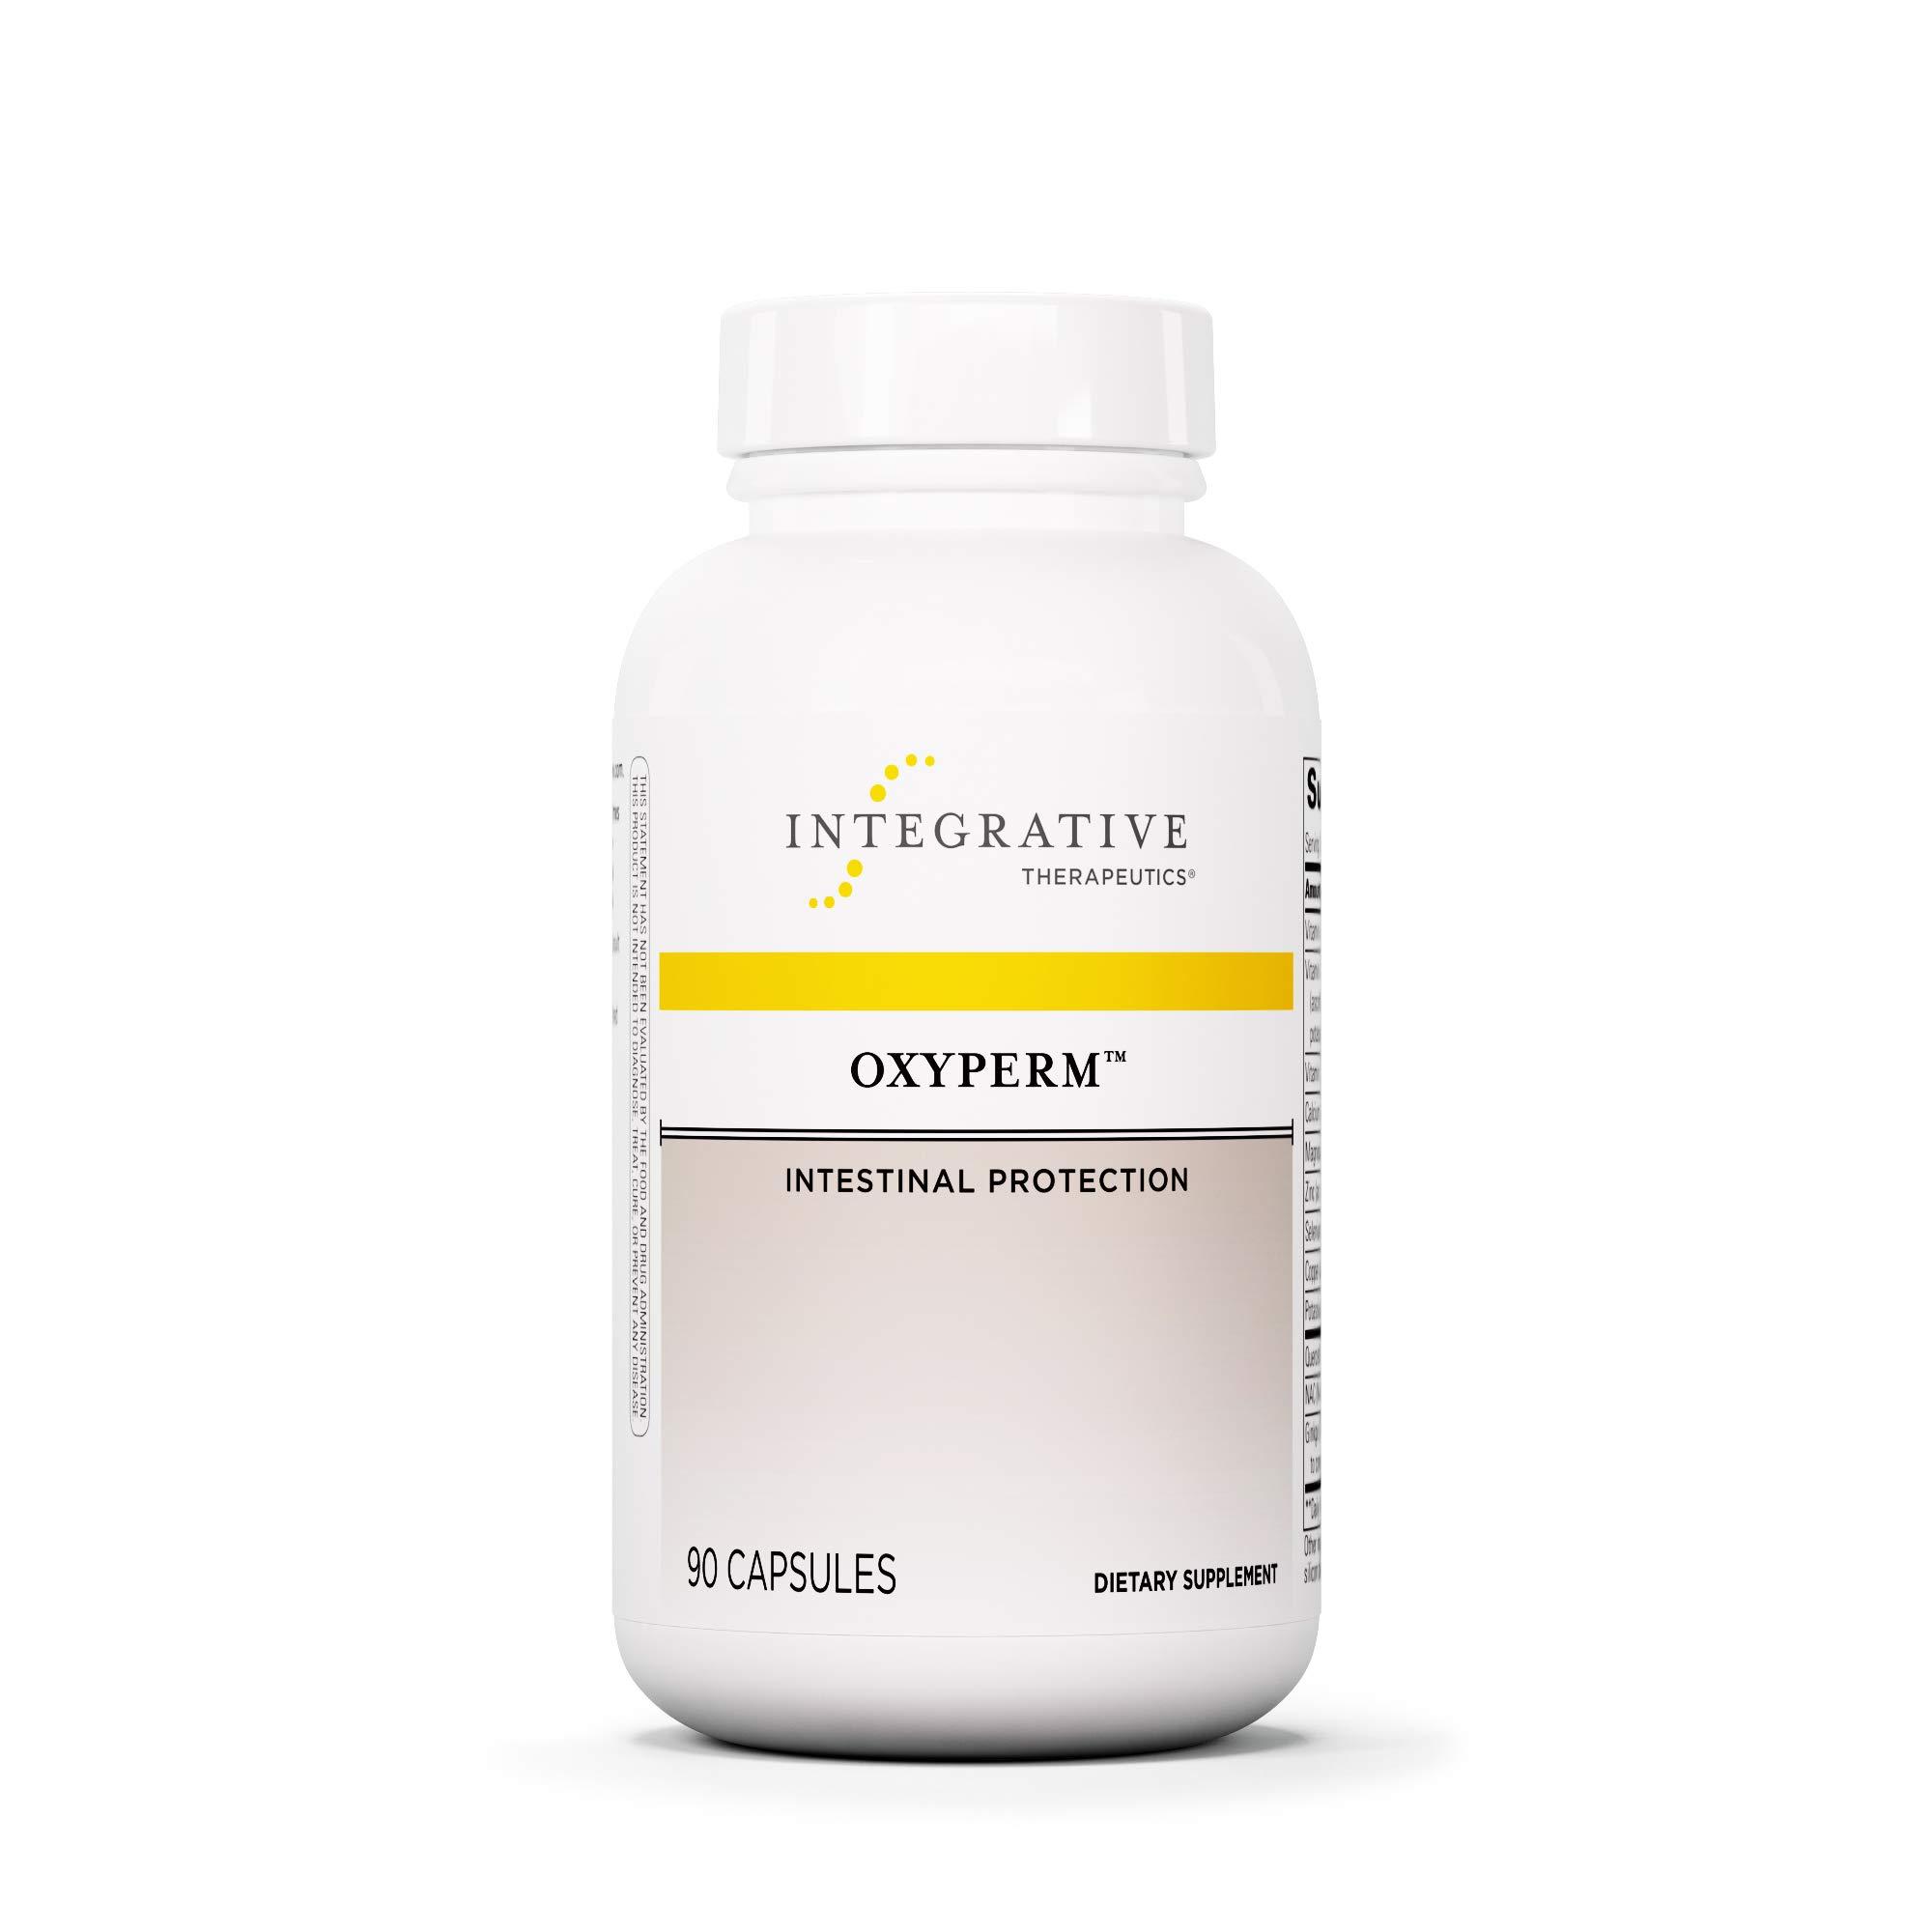 Integrative Therapeutics - Oxyperm - Intestinal Antioxidant Protection Supplement - 90 Capsules